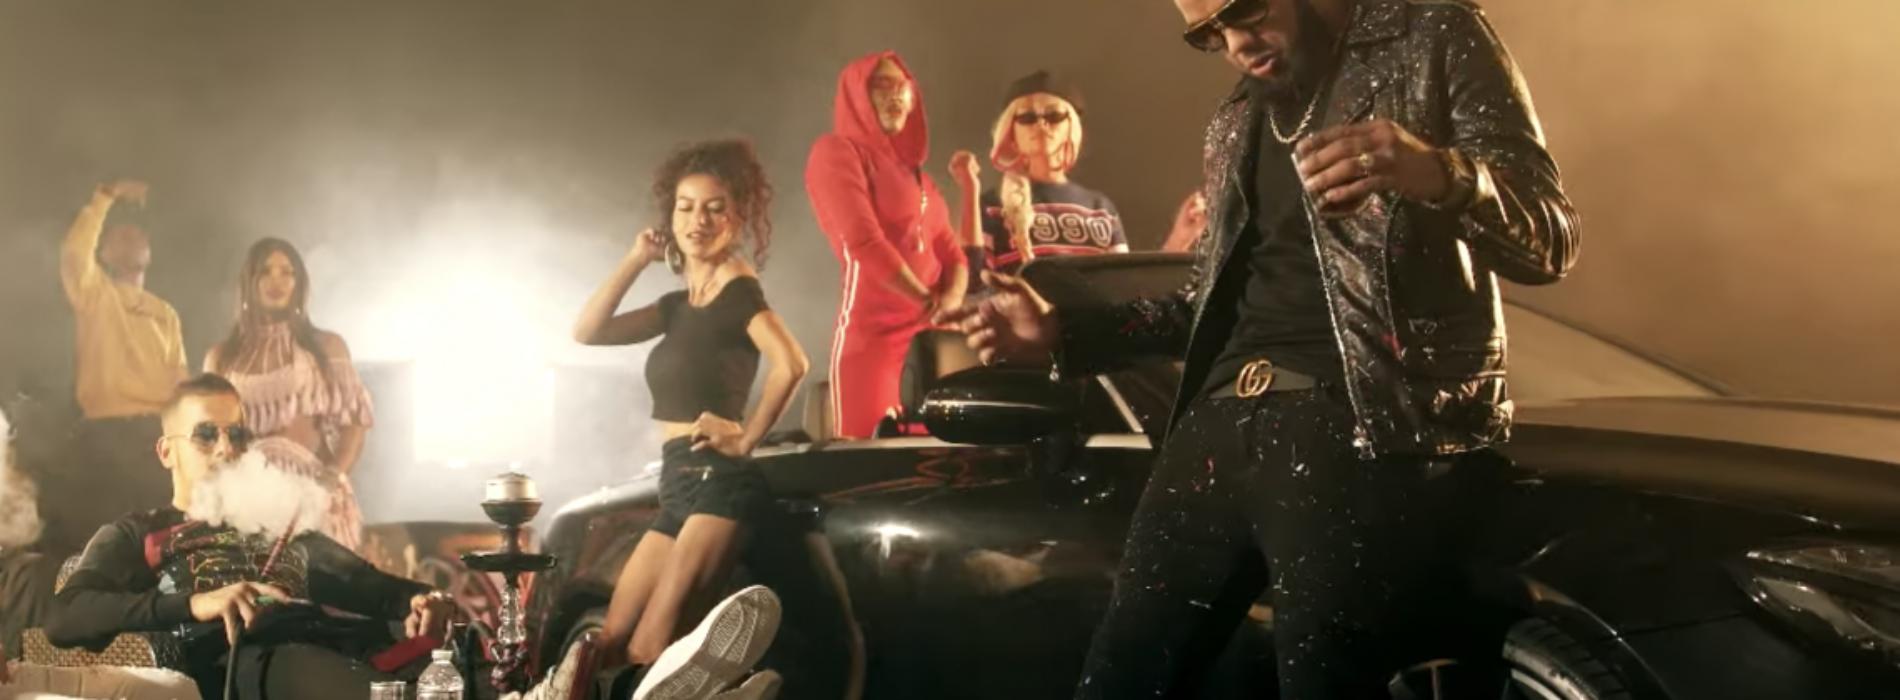 Lady Lova feat Tmatt «Mal Élevé» (Clip officiel) – Octobre 2018